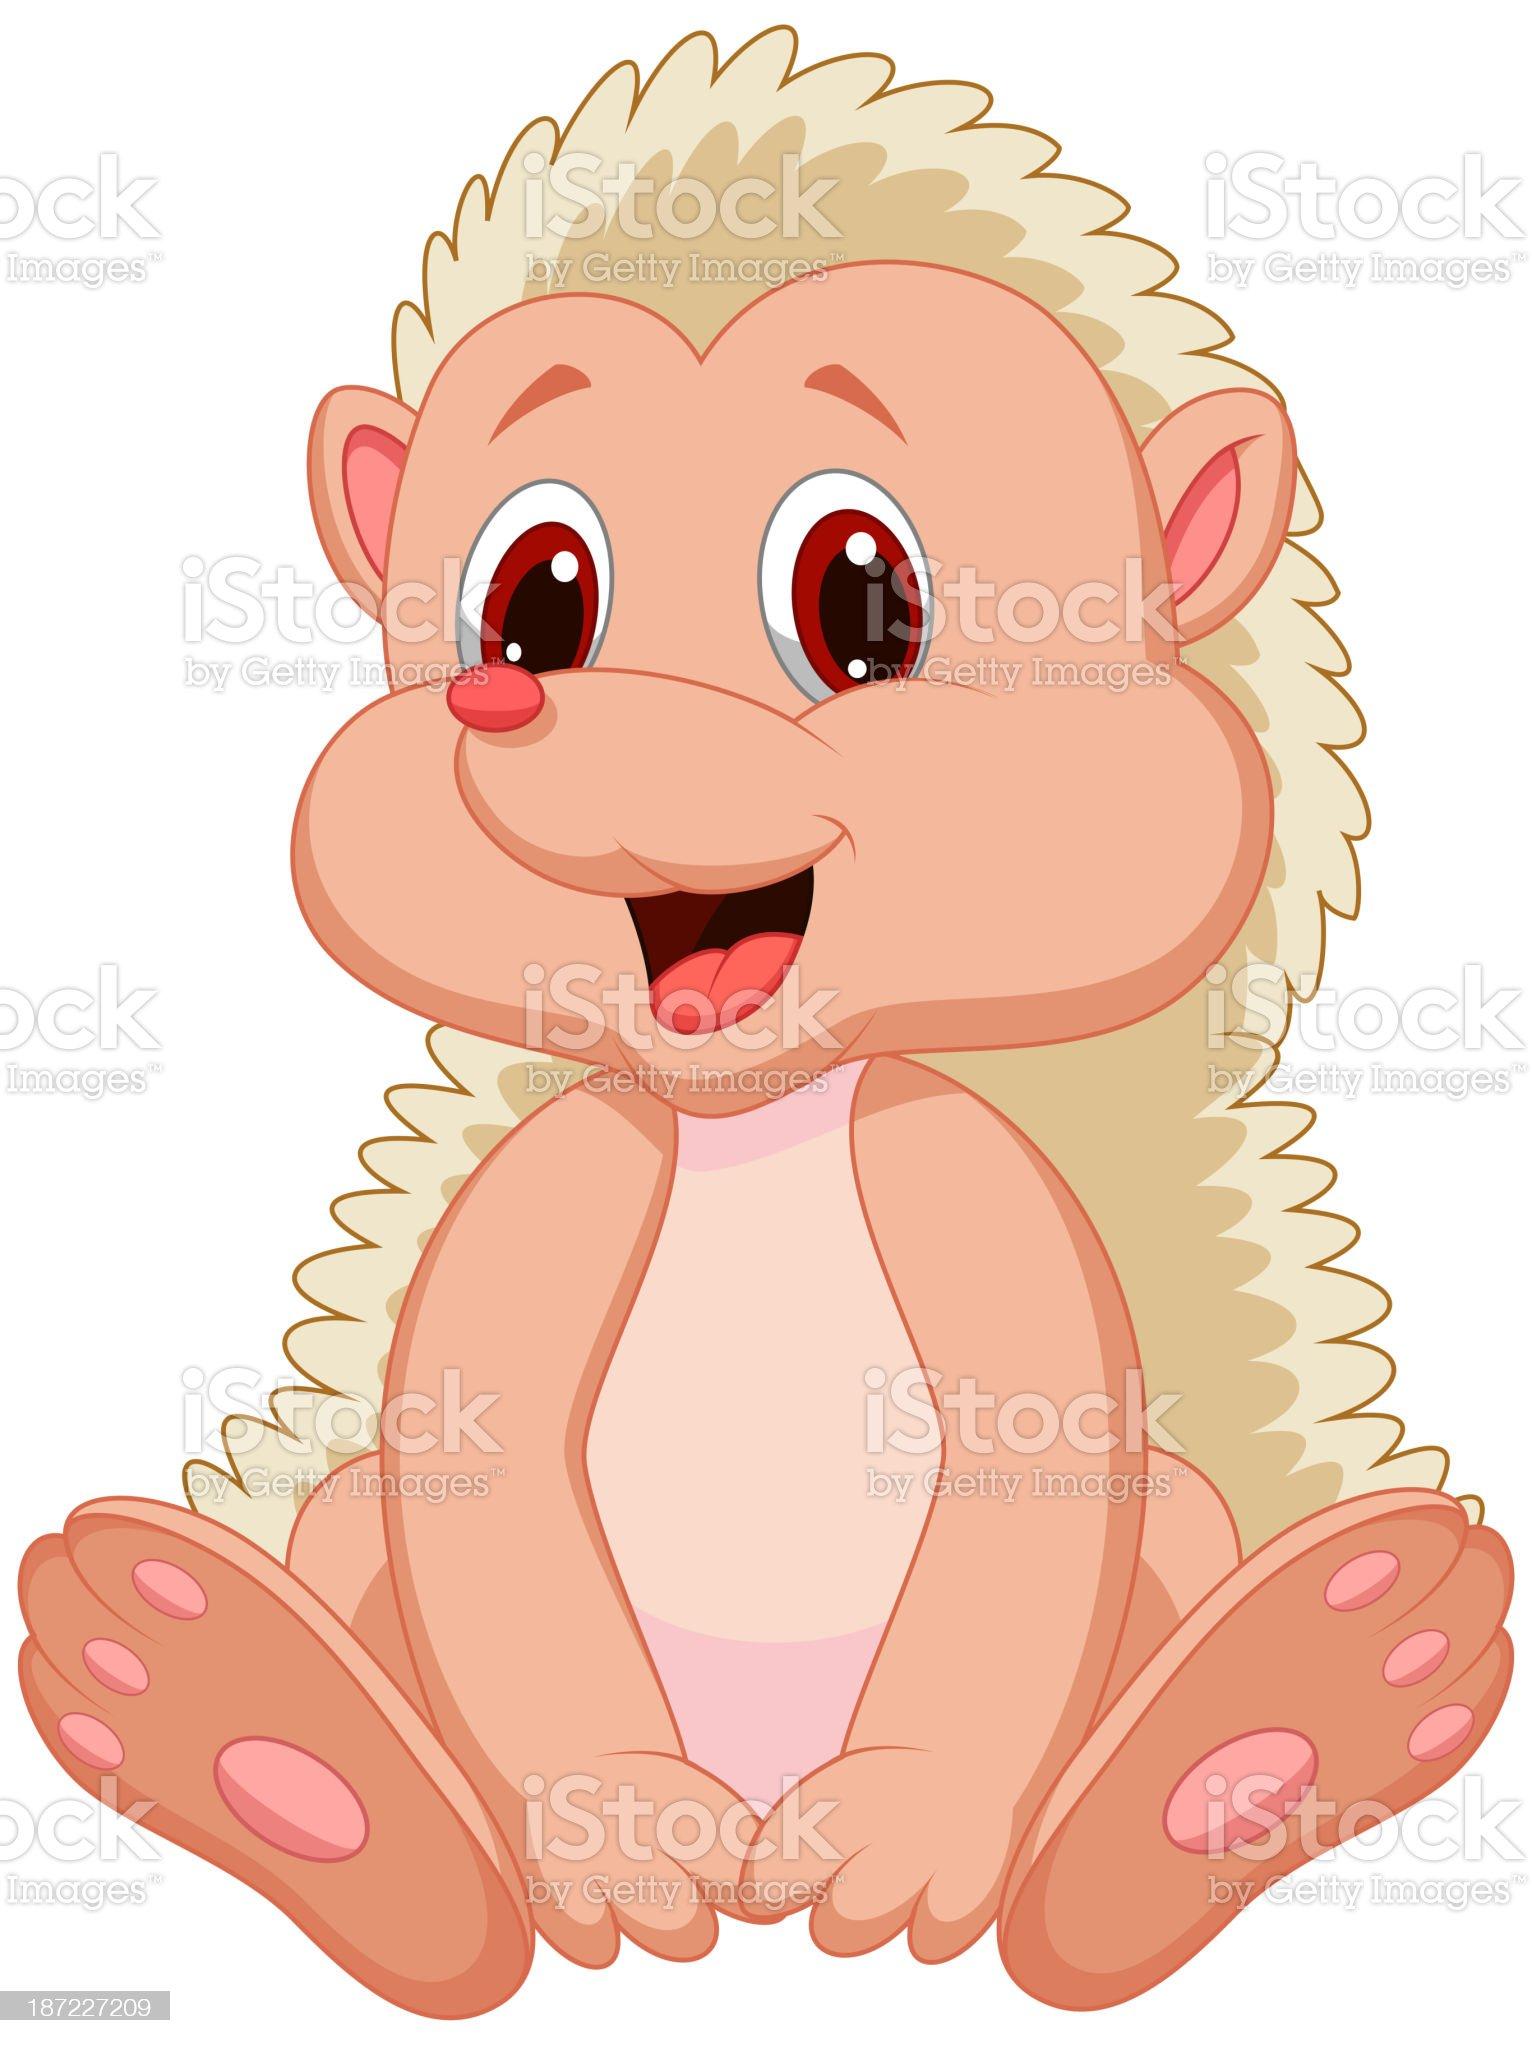 Cute hedgehog cartoon royalty-free stock vector art